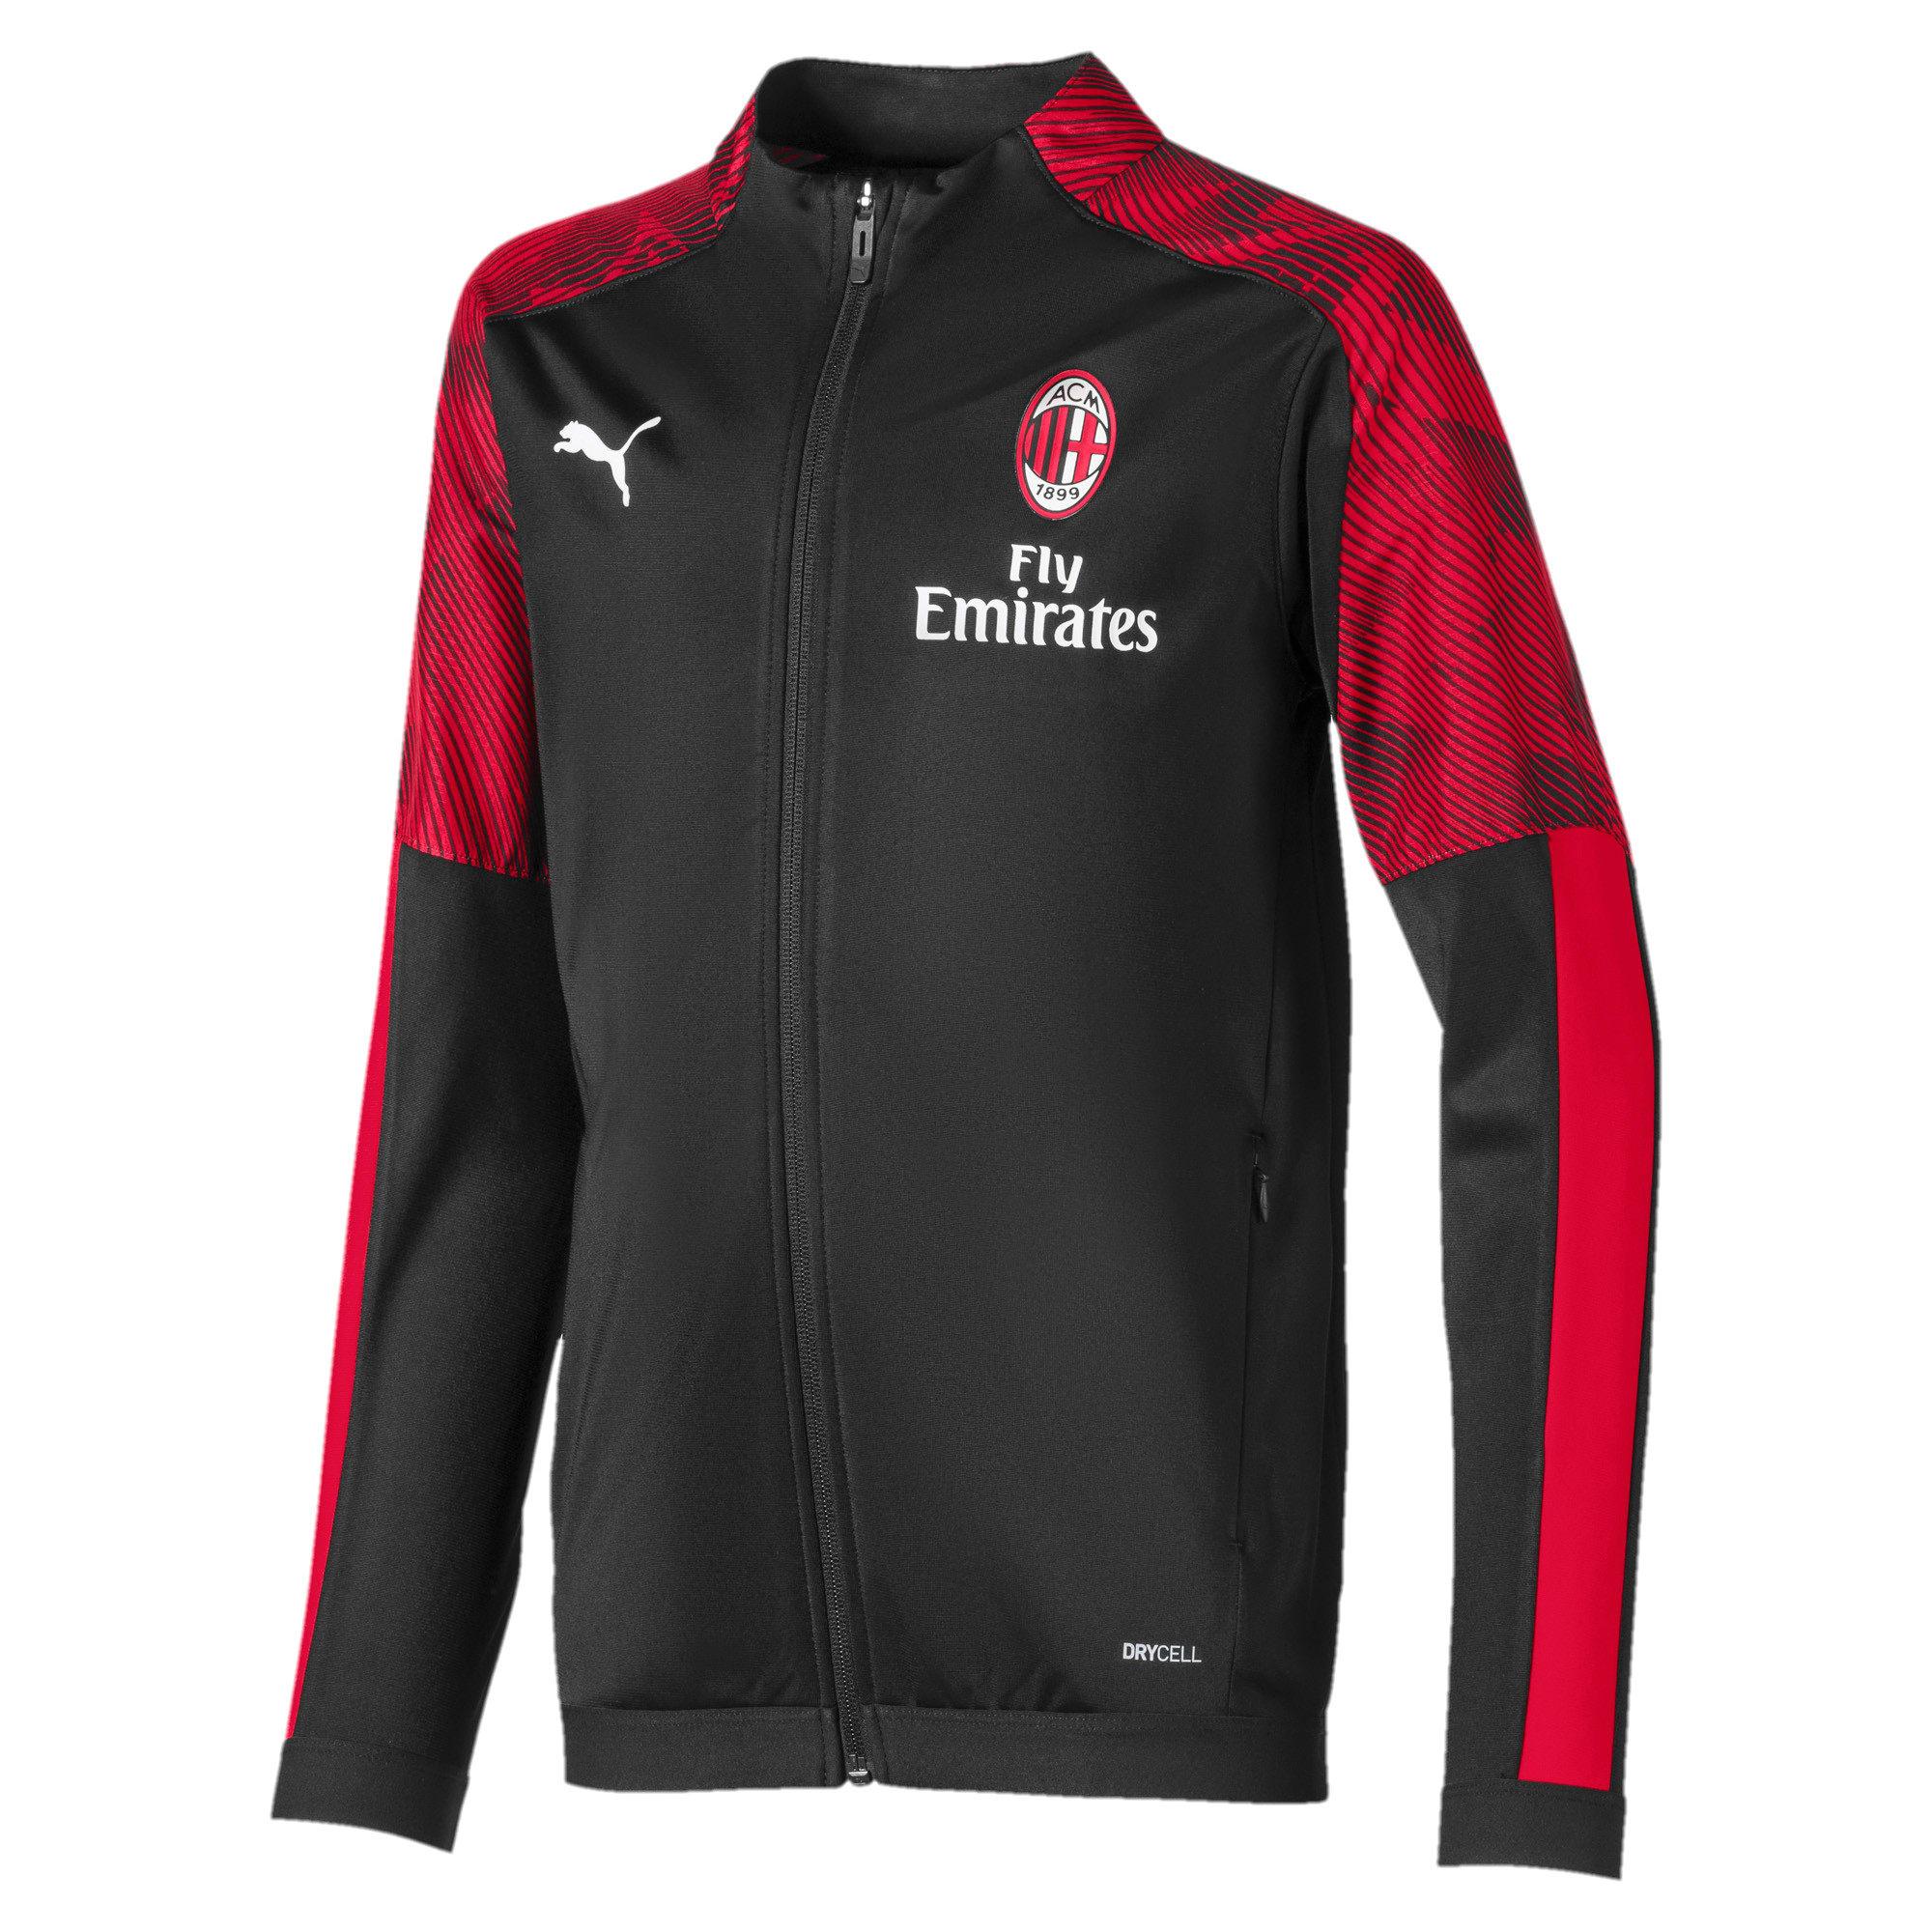 Thumbnail 1 of AC Milan Boys' Poly Jacket, Puma Black-Tango Red, medium